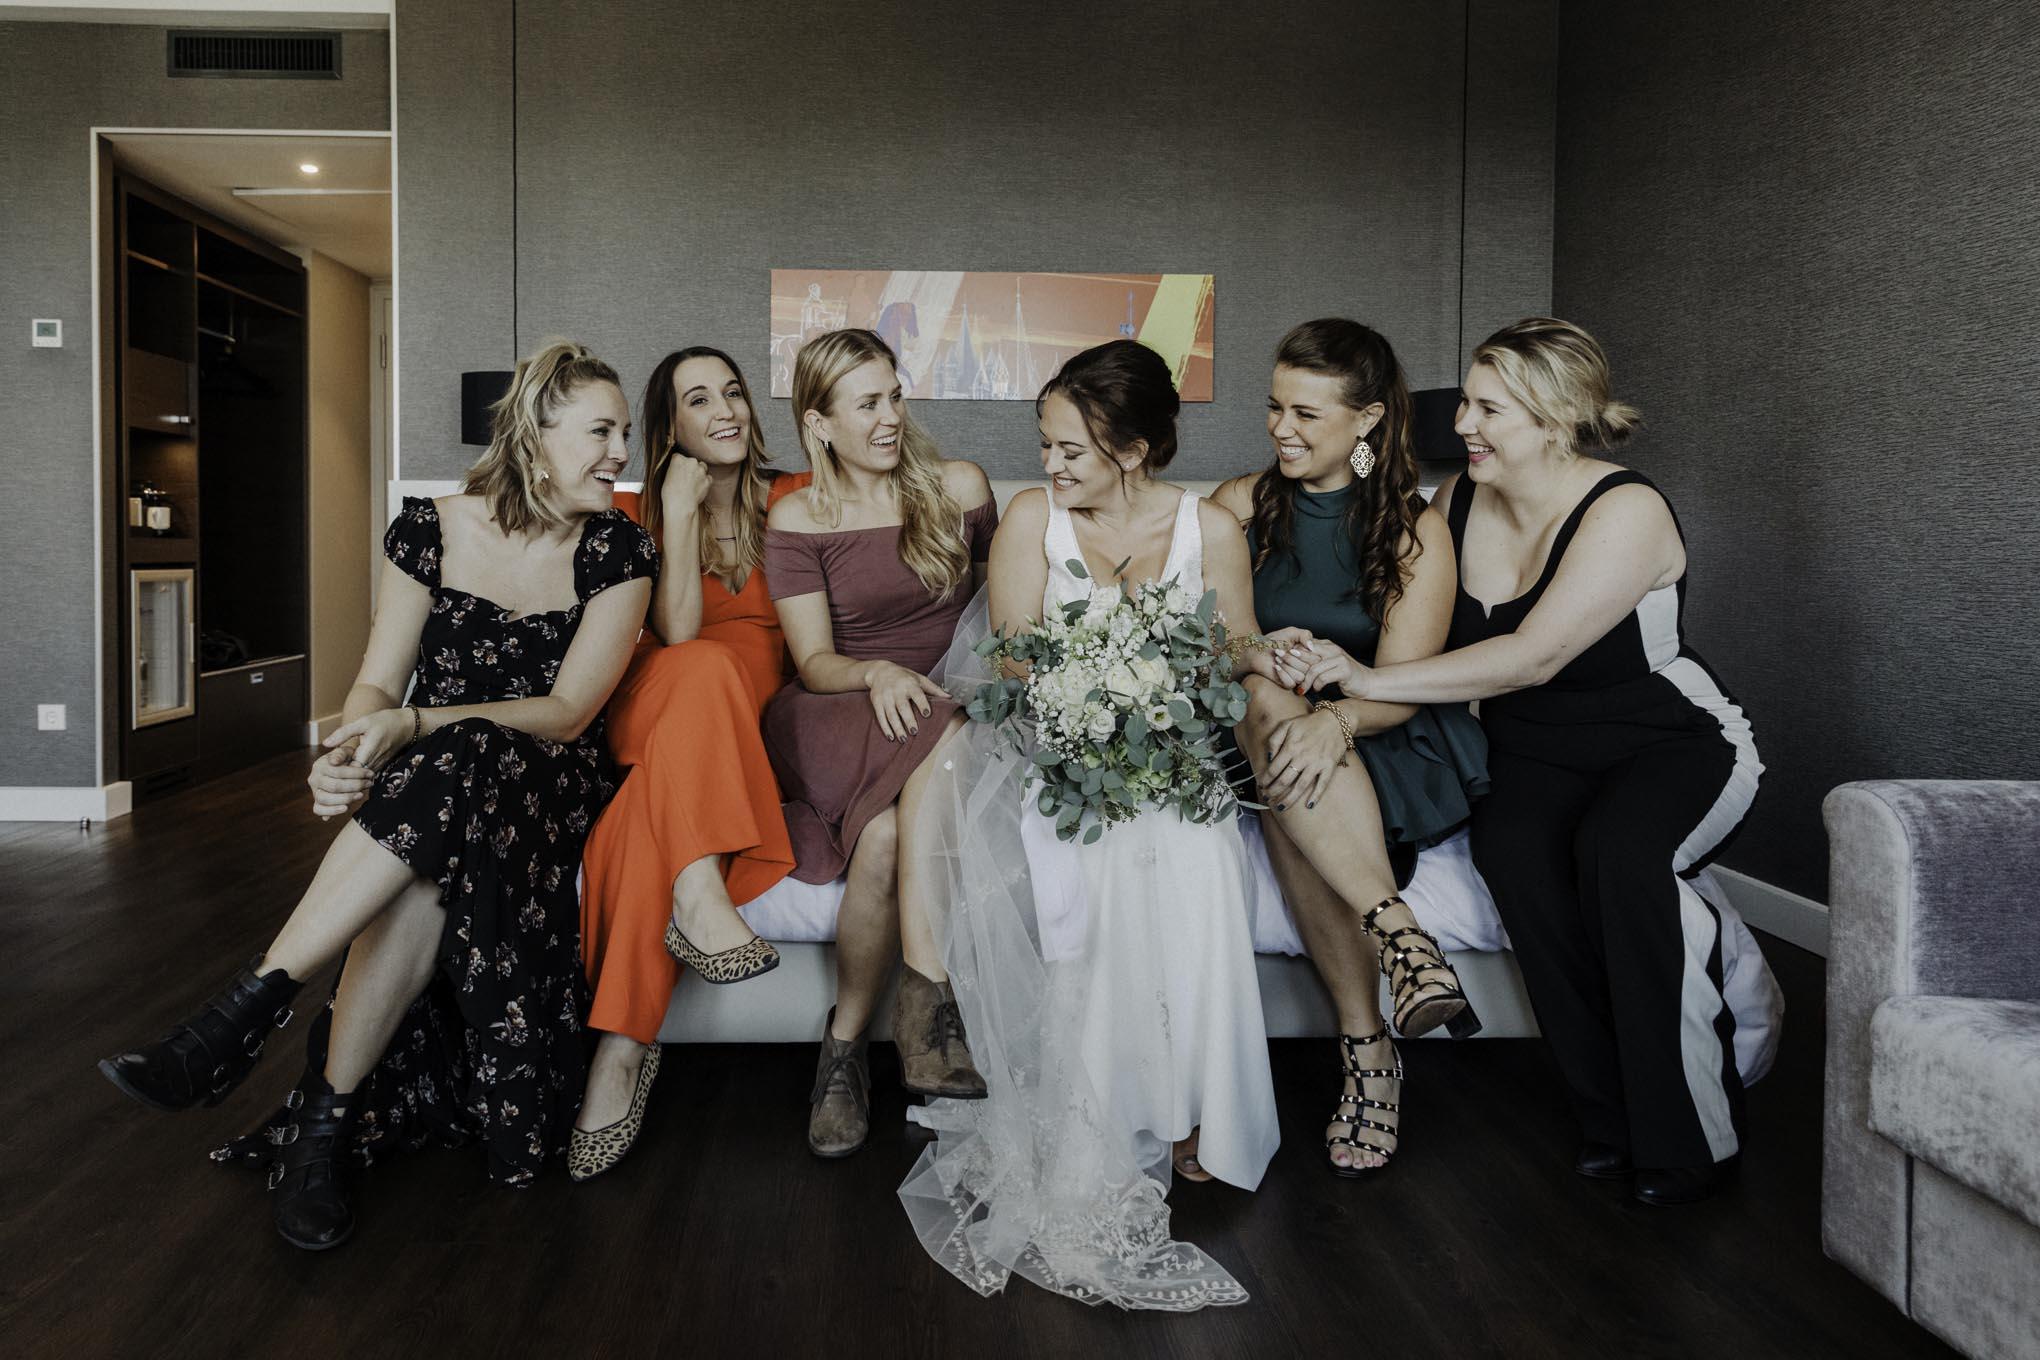 Freundinnen beim getting ready der Braut